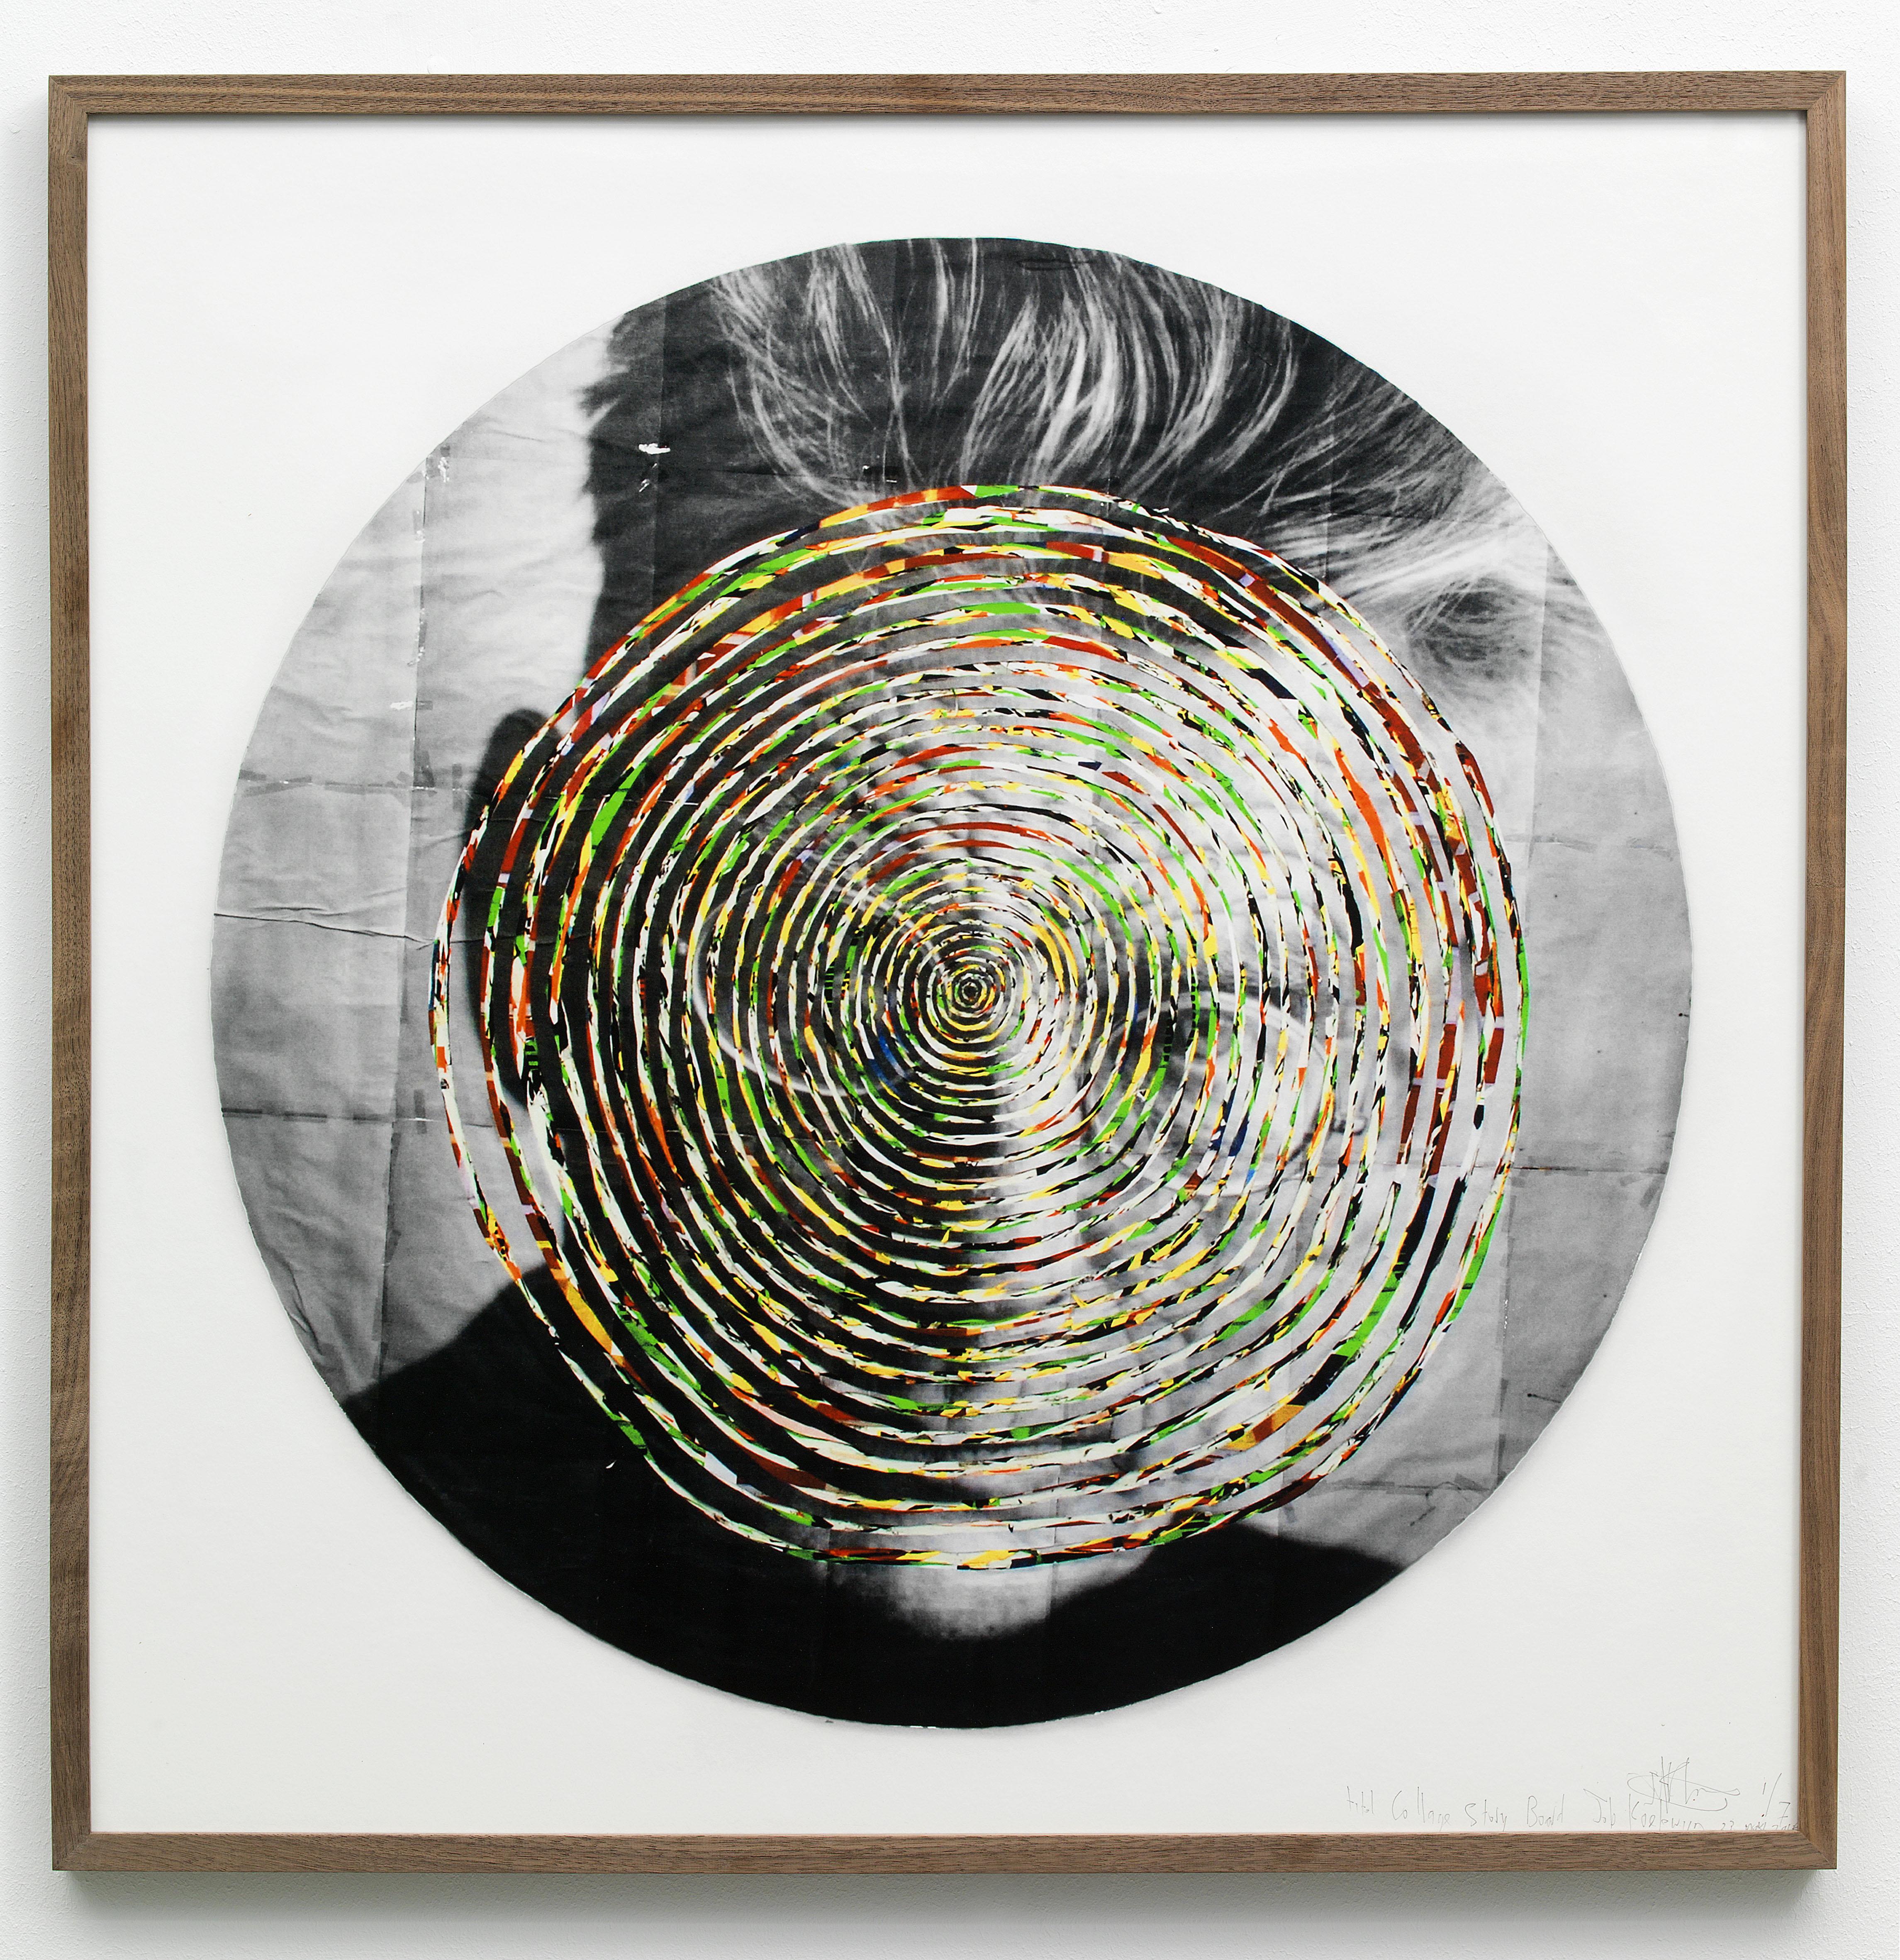 Fons Welters. Job Koelewijn, Collage_  Storyboard [Beckett], 2012, c-print, framed, 80 x 80 cm